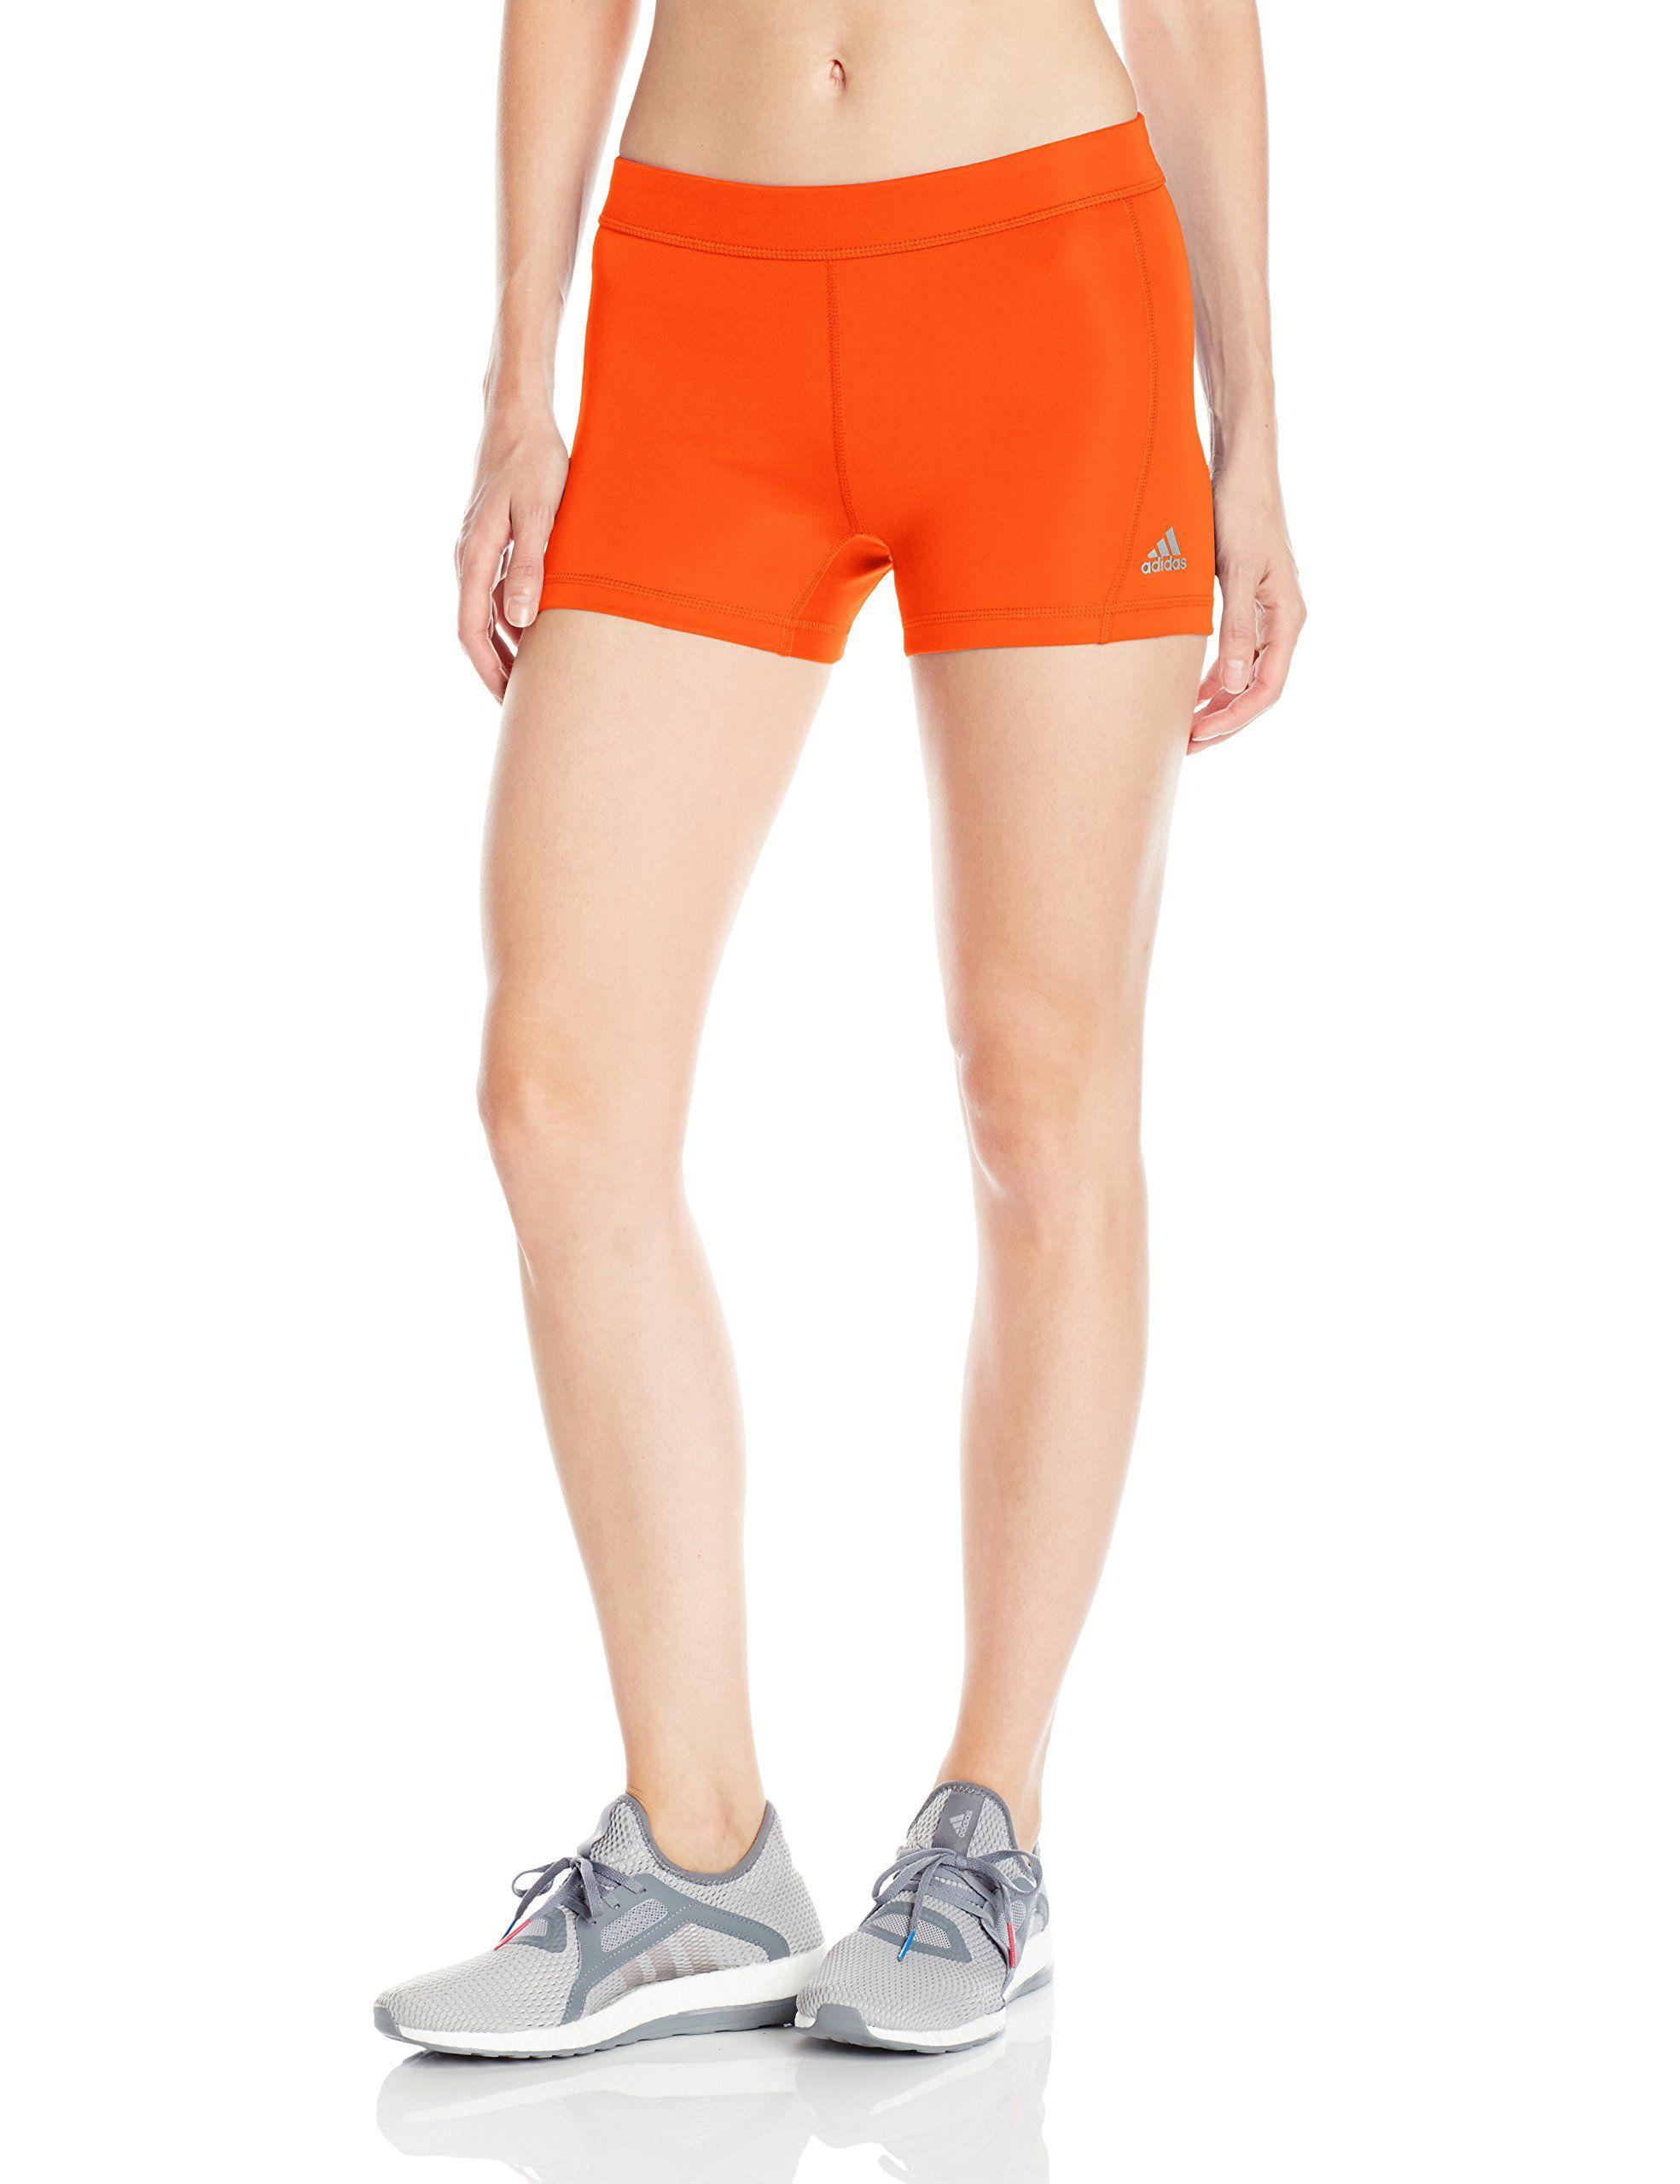 aba45f592e031 adidas Women's Training Techfit Short Tights, Energy Orange/Silver, X-Large.